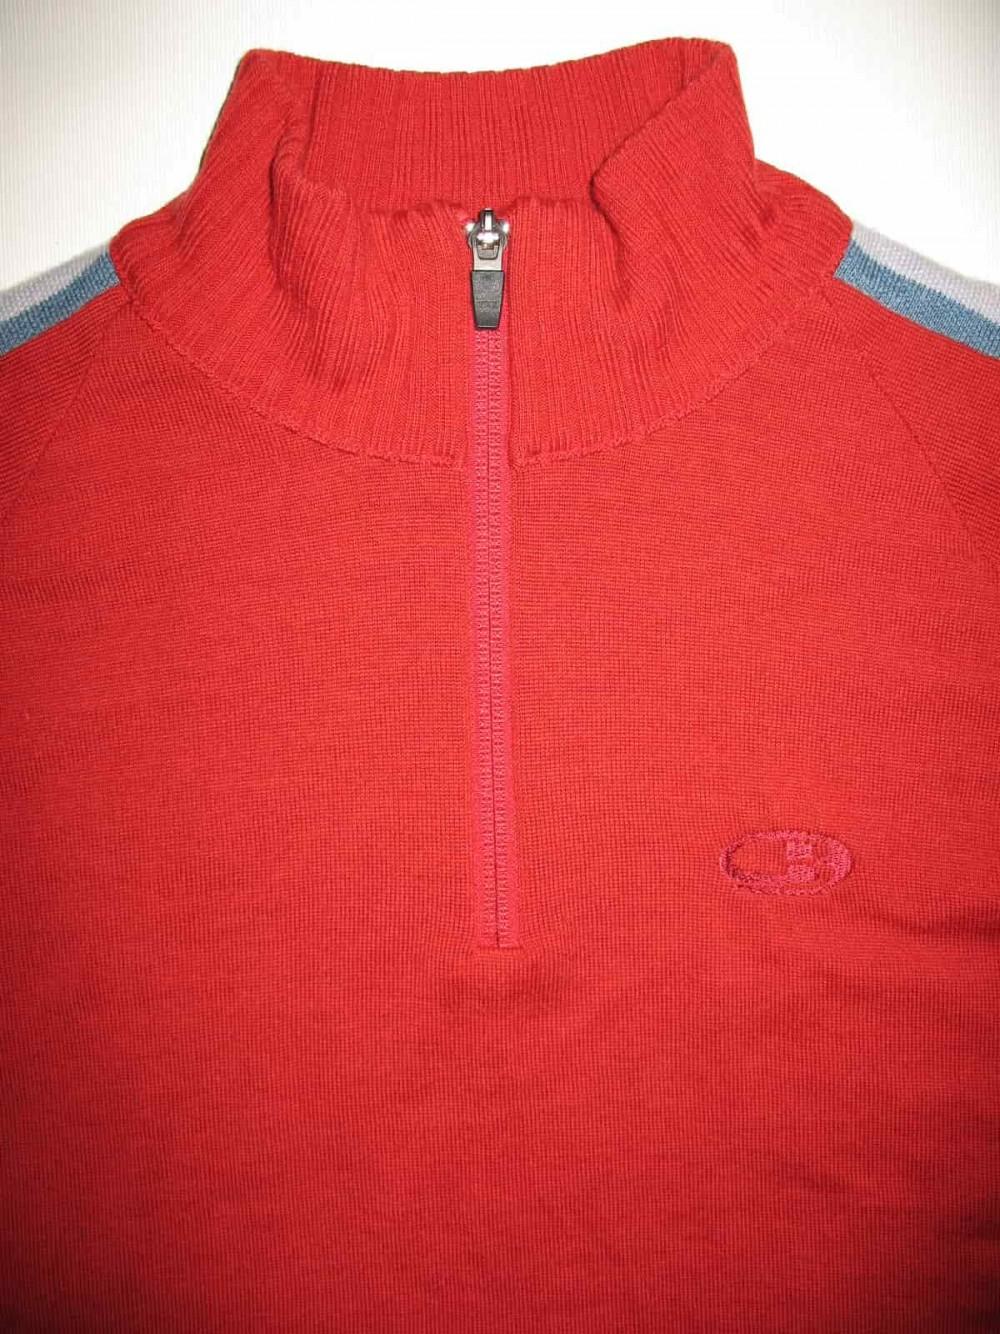 Кофта ICEBREAKER sport LTD jersey (размер L) - 2